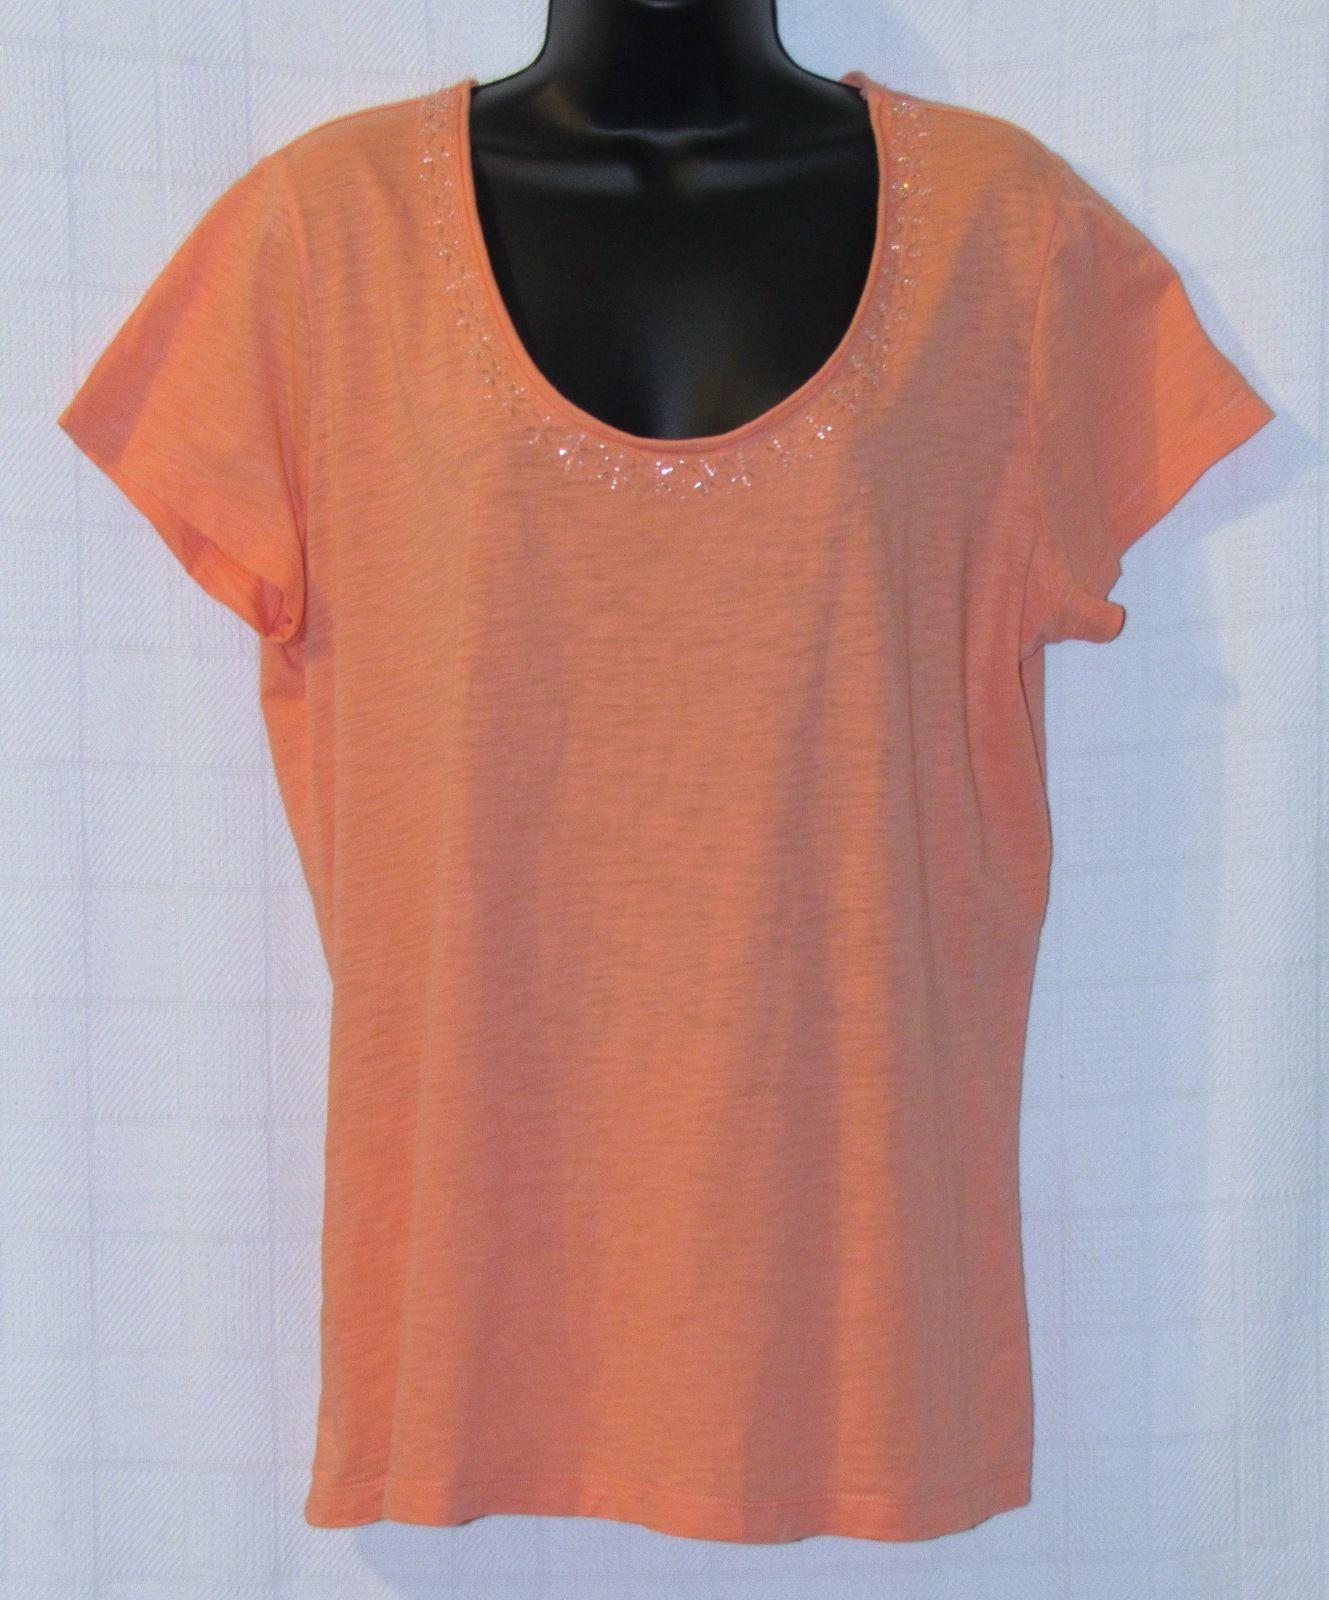 St. John's Bay Embellished Apricot-Peach-Cotton Knit Top Size: XL